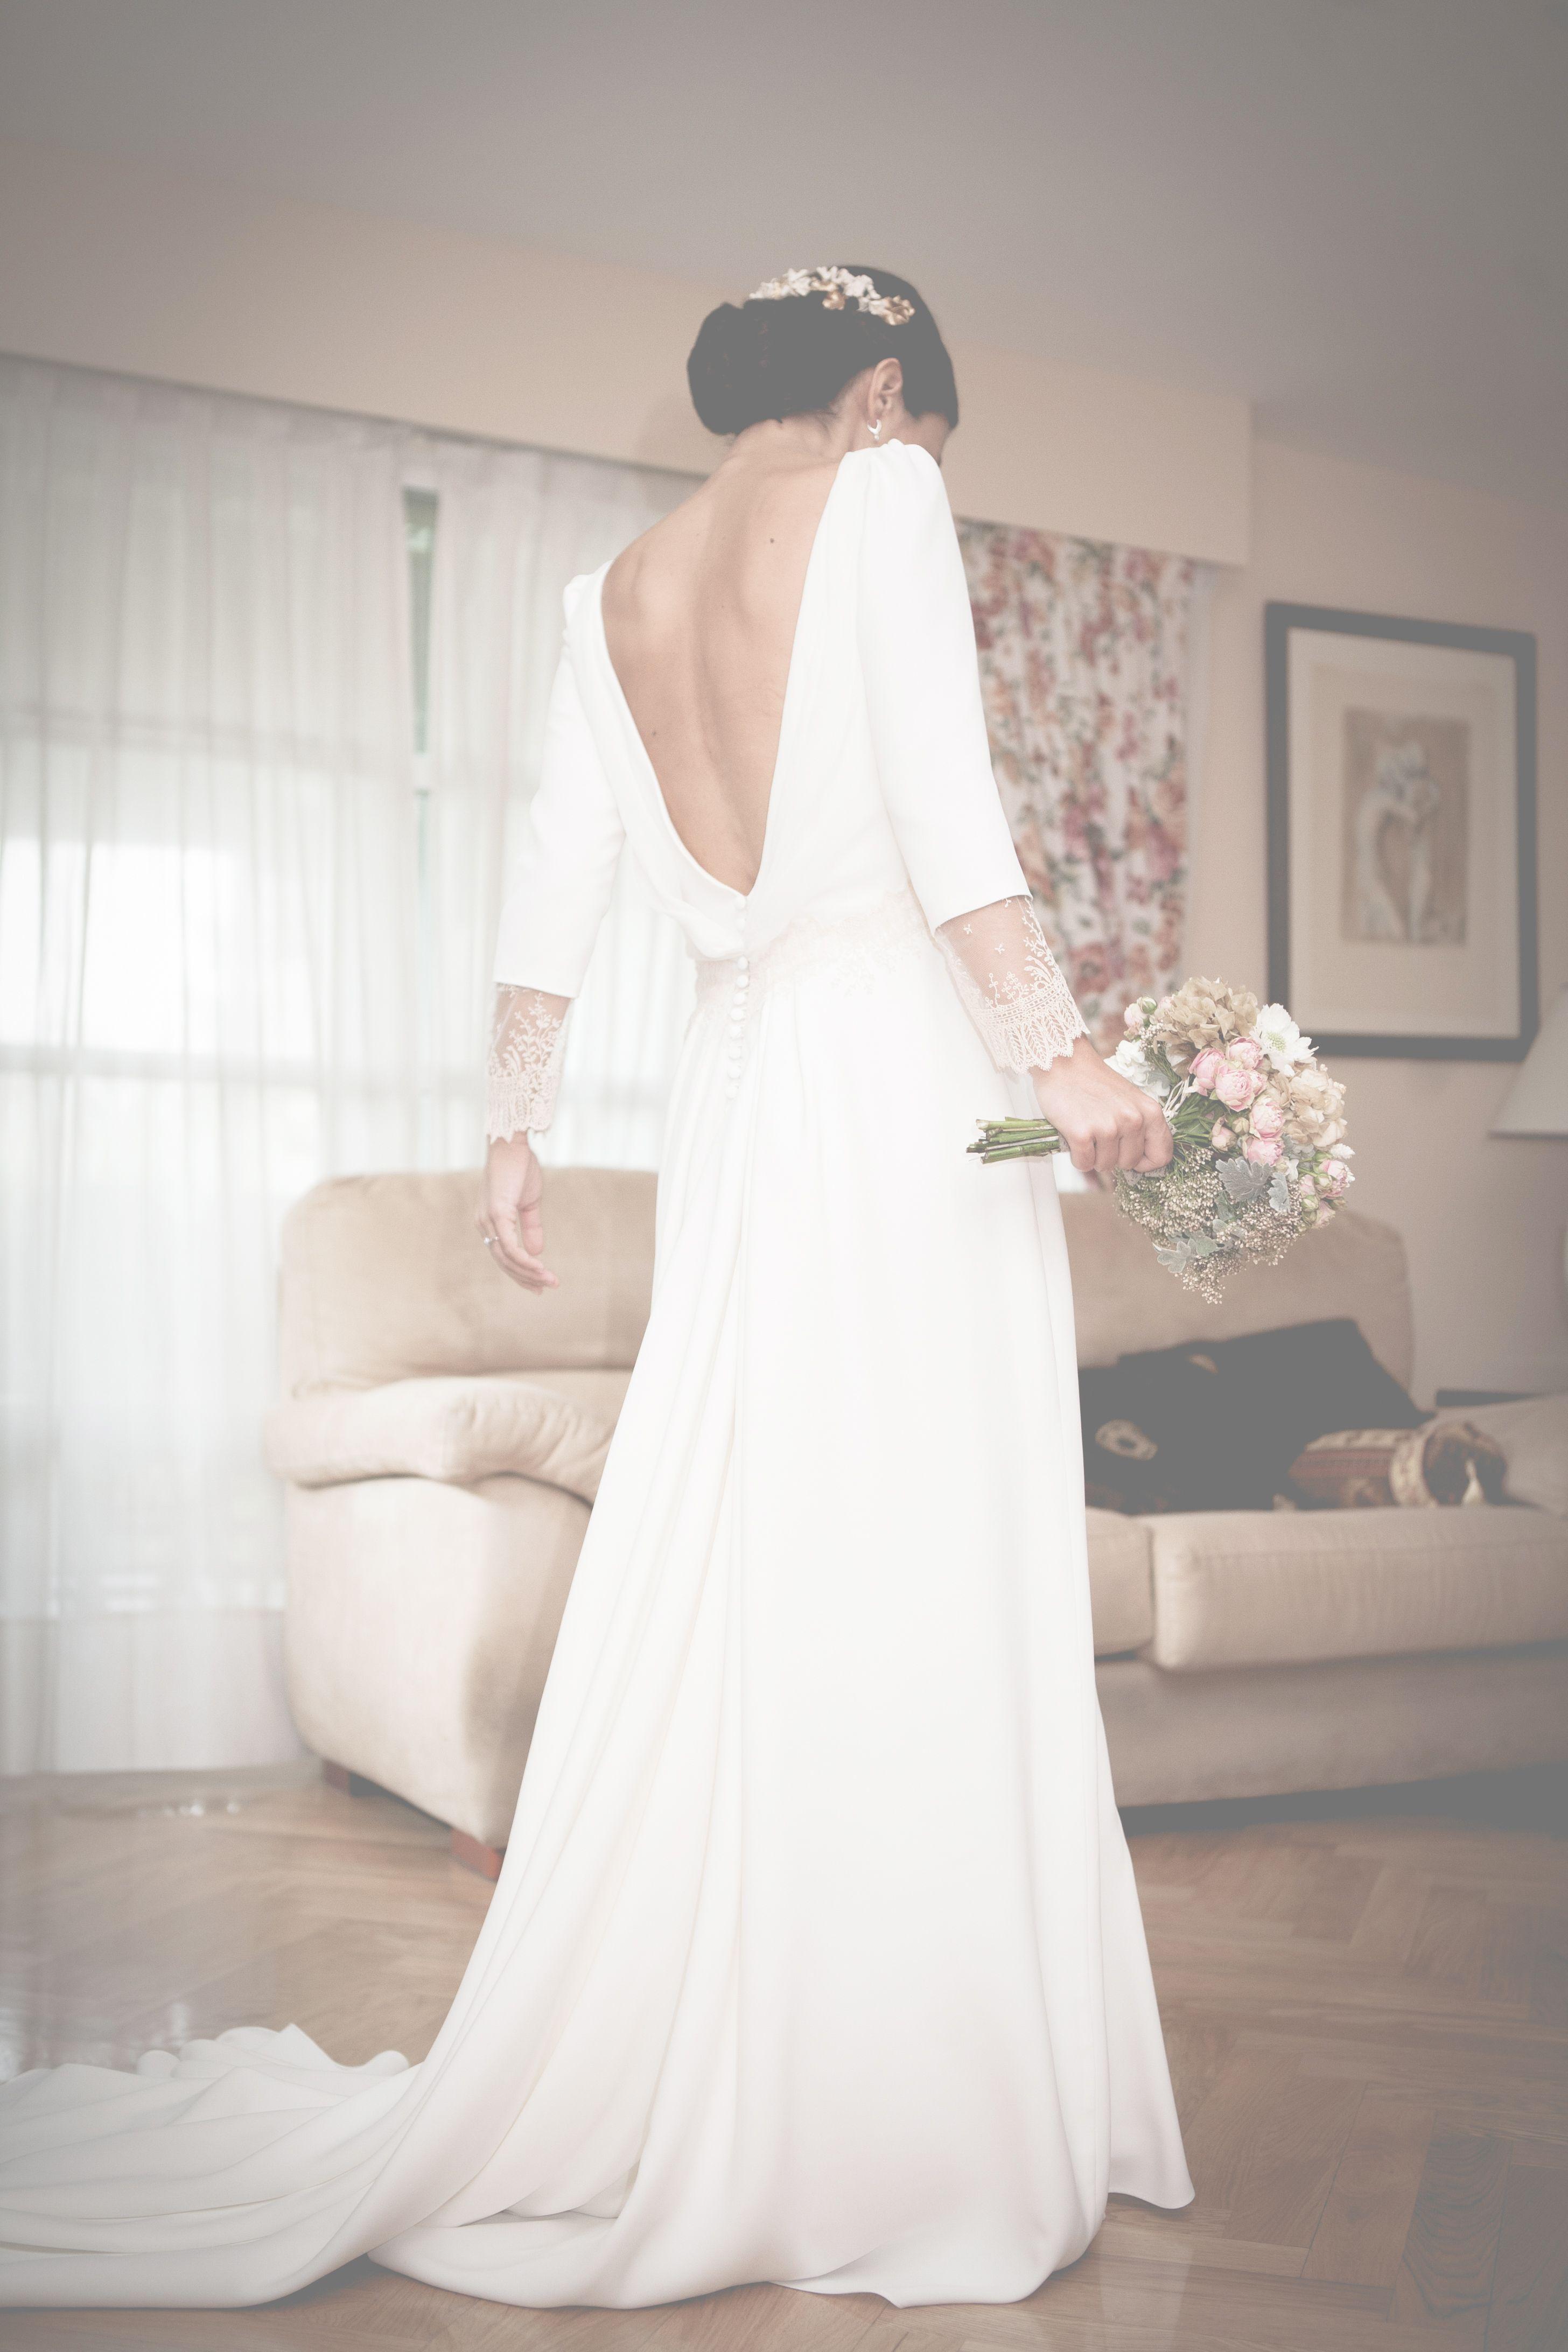 Simply wedding dress with sexy v back neck f a s h i o n for Simply white wedding dresses